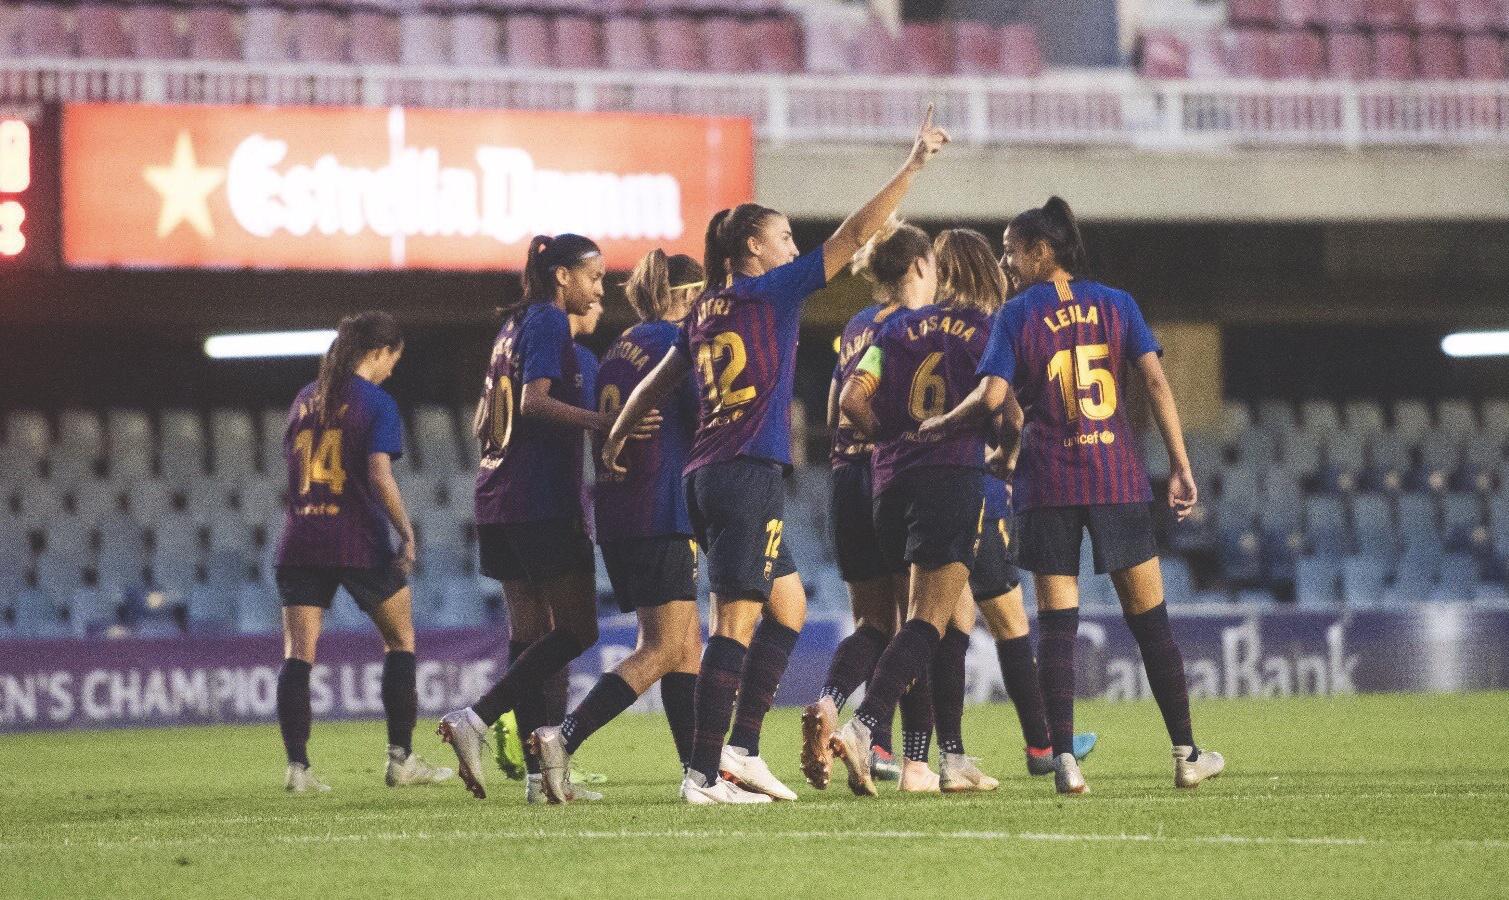 FC Barcelona Femení celebrate scoring against Glasgow City in the Women's Champions League